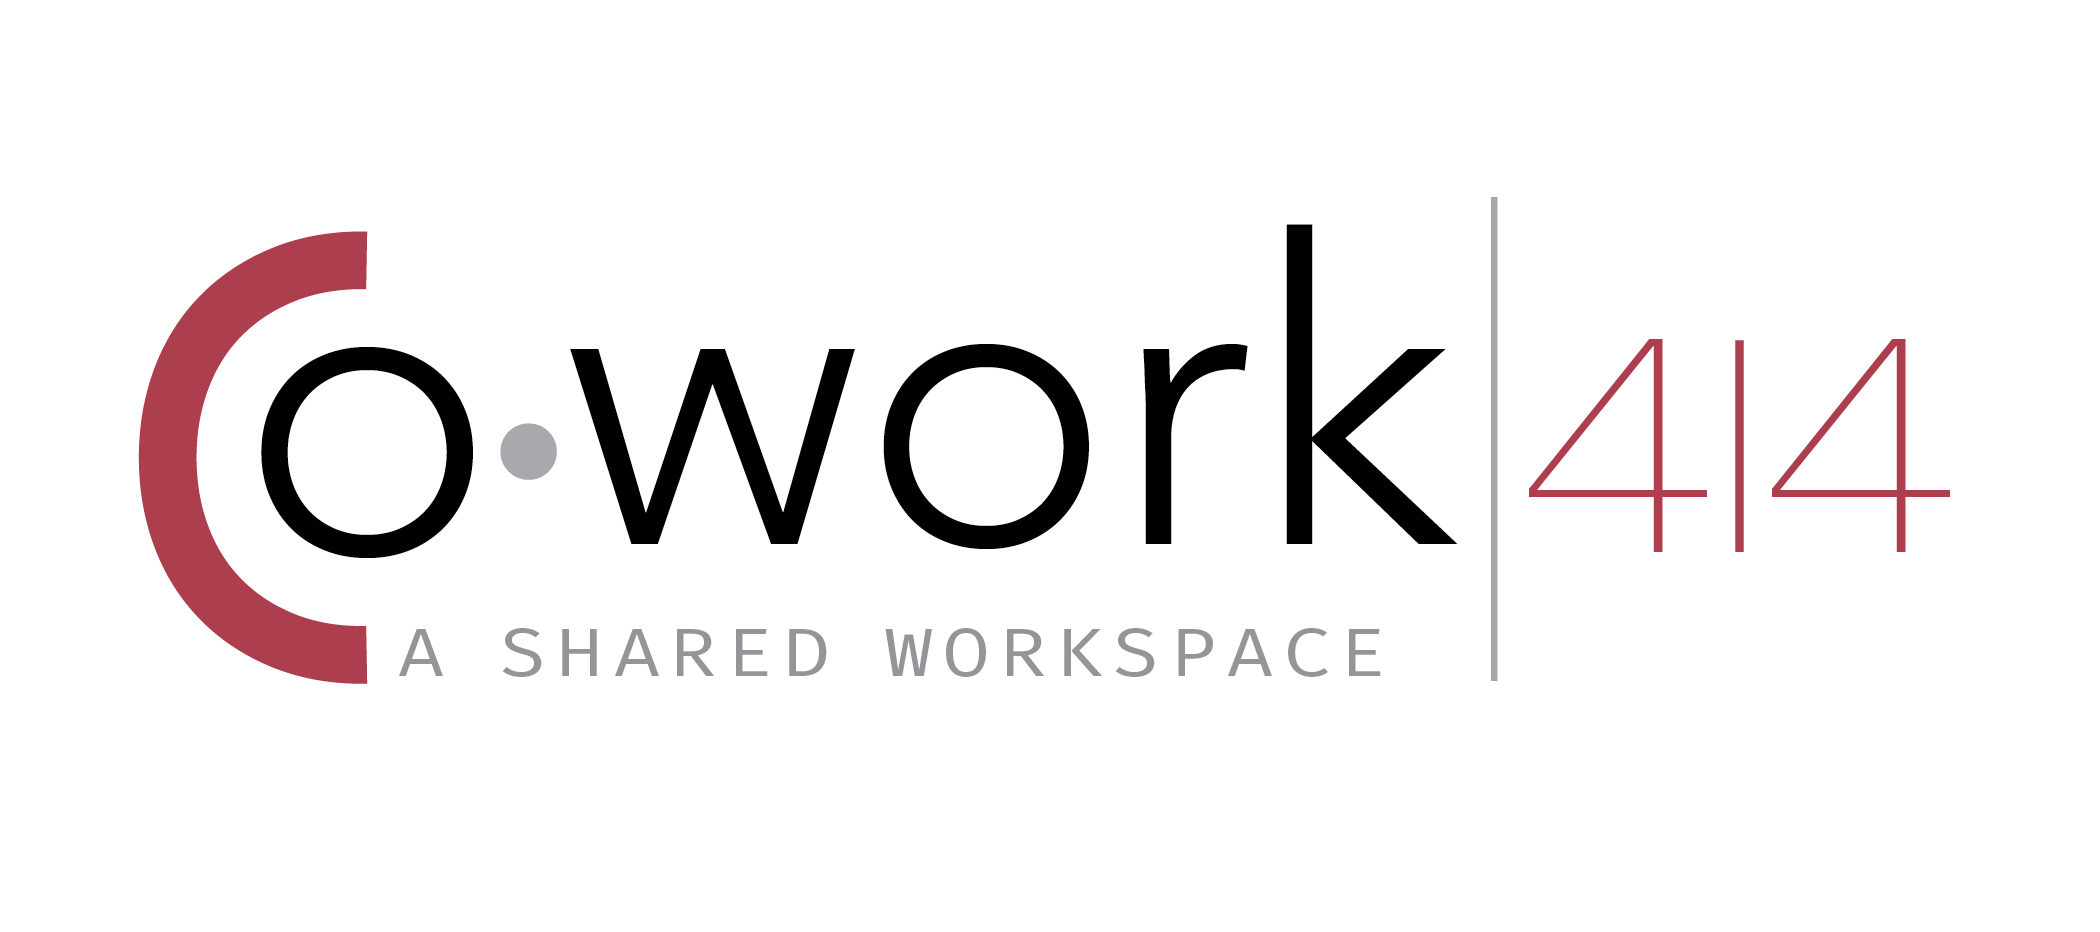 Cowork 414